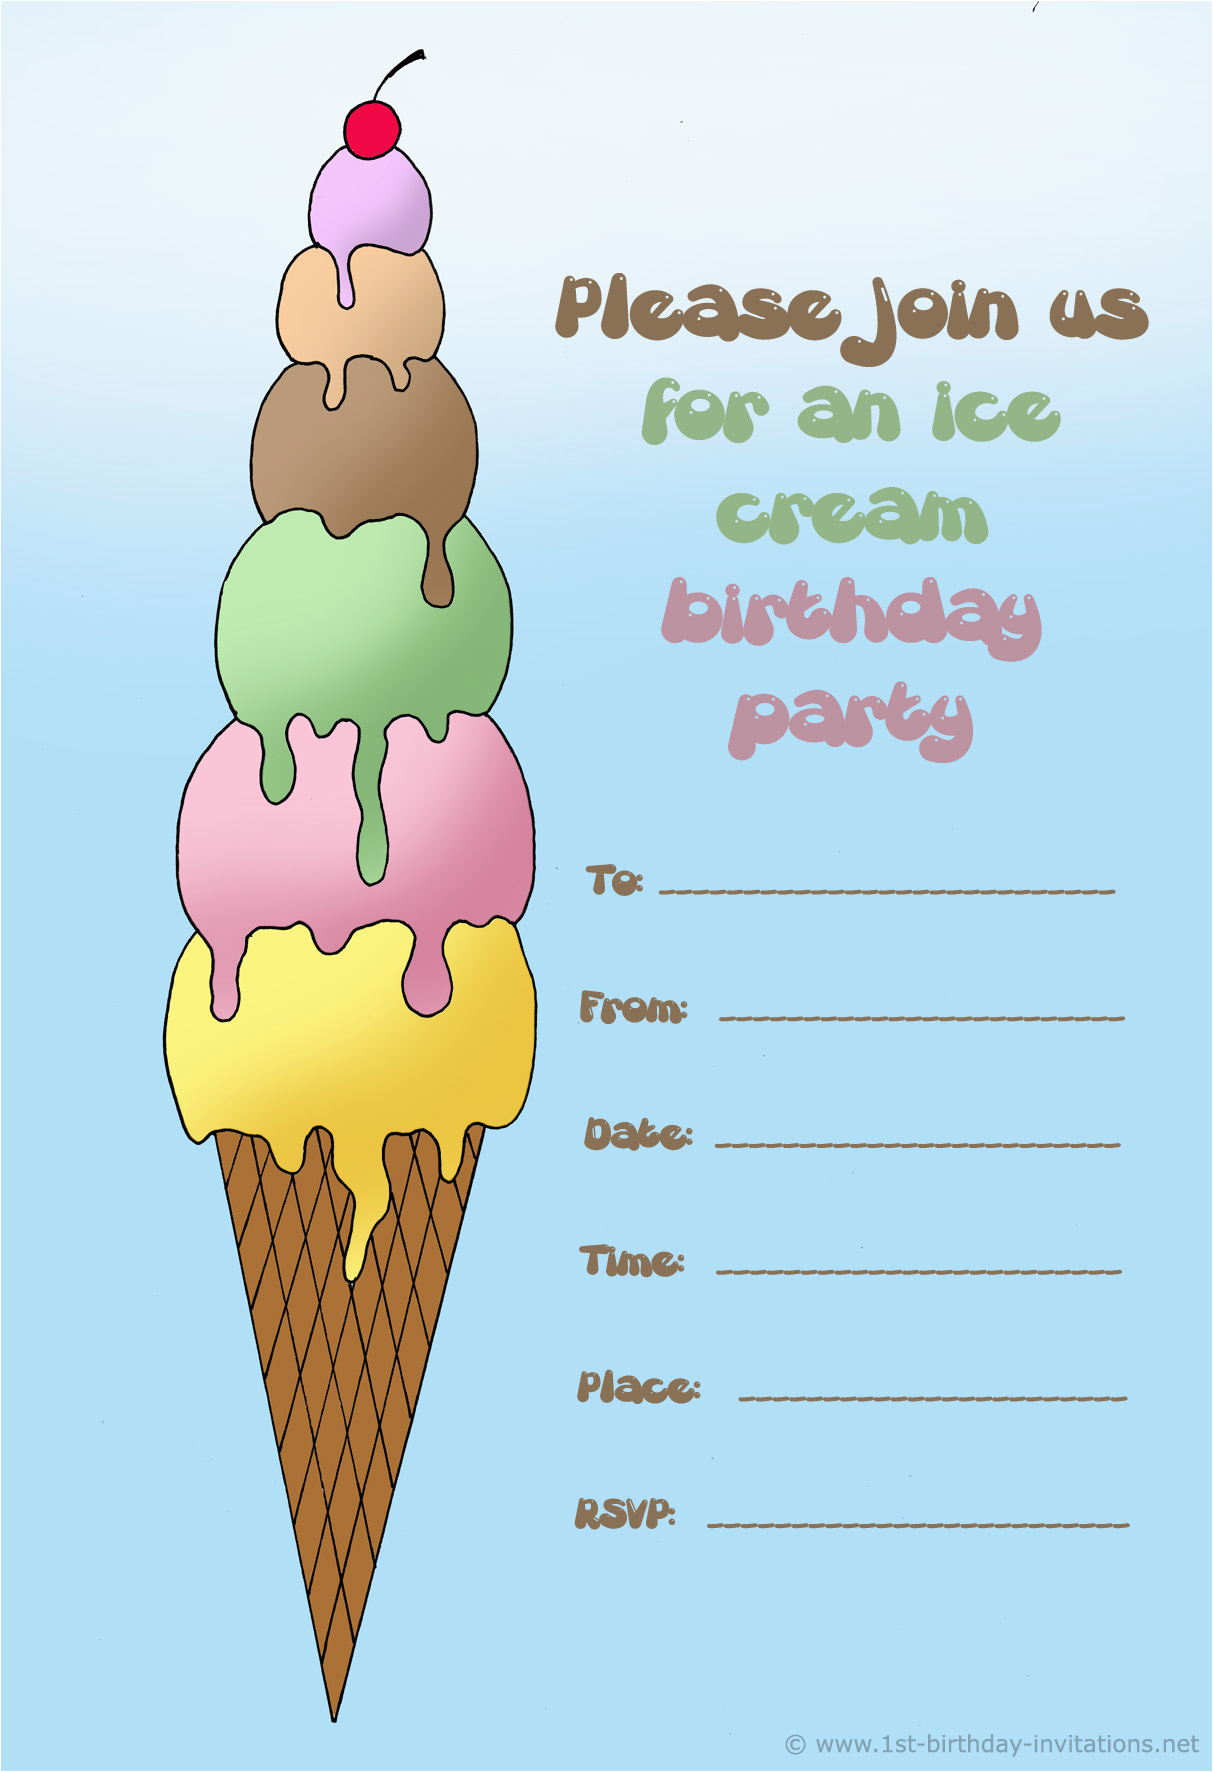 How to Print Birthday Invitations for Free 14 Printable Birthday Invitations Many Fun themes